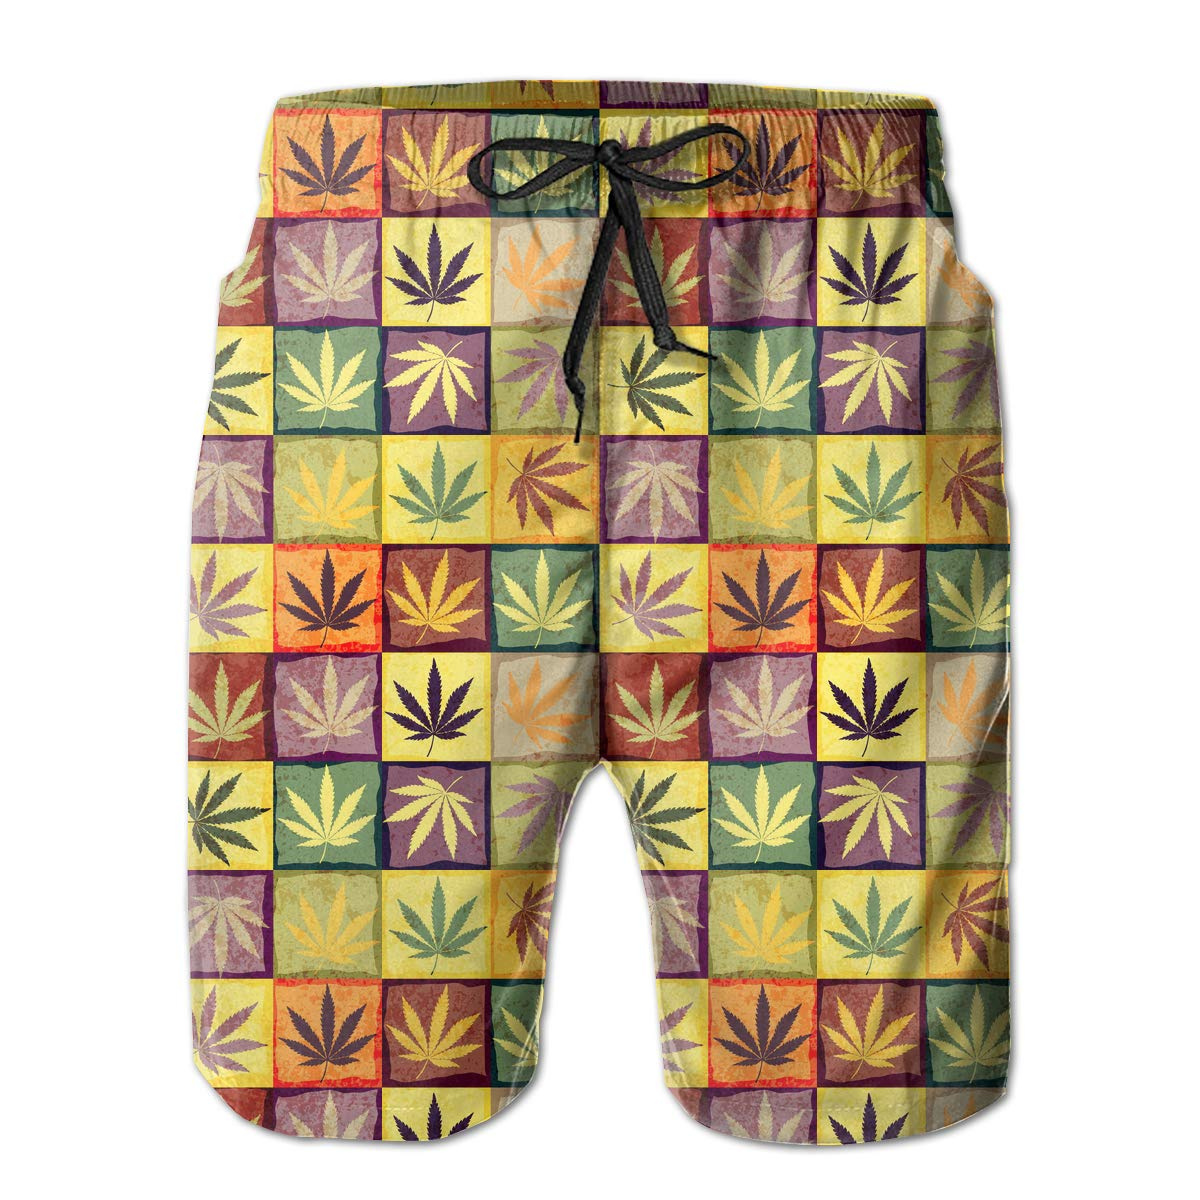 Retro Hemp Leaves Pattern Mens Fashion Board//Beach Shorts Casual Classic Pockets Swim Trunks